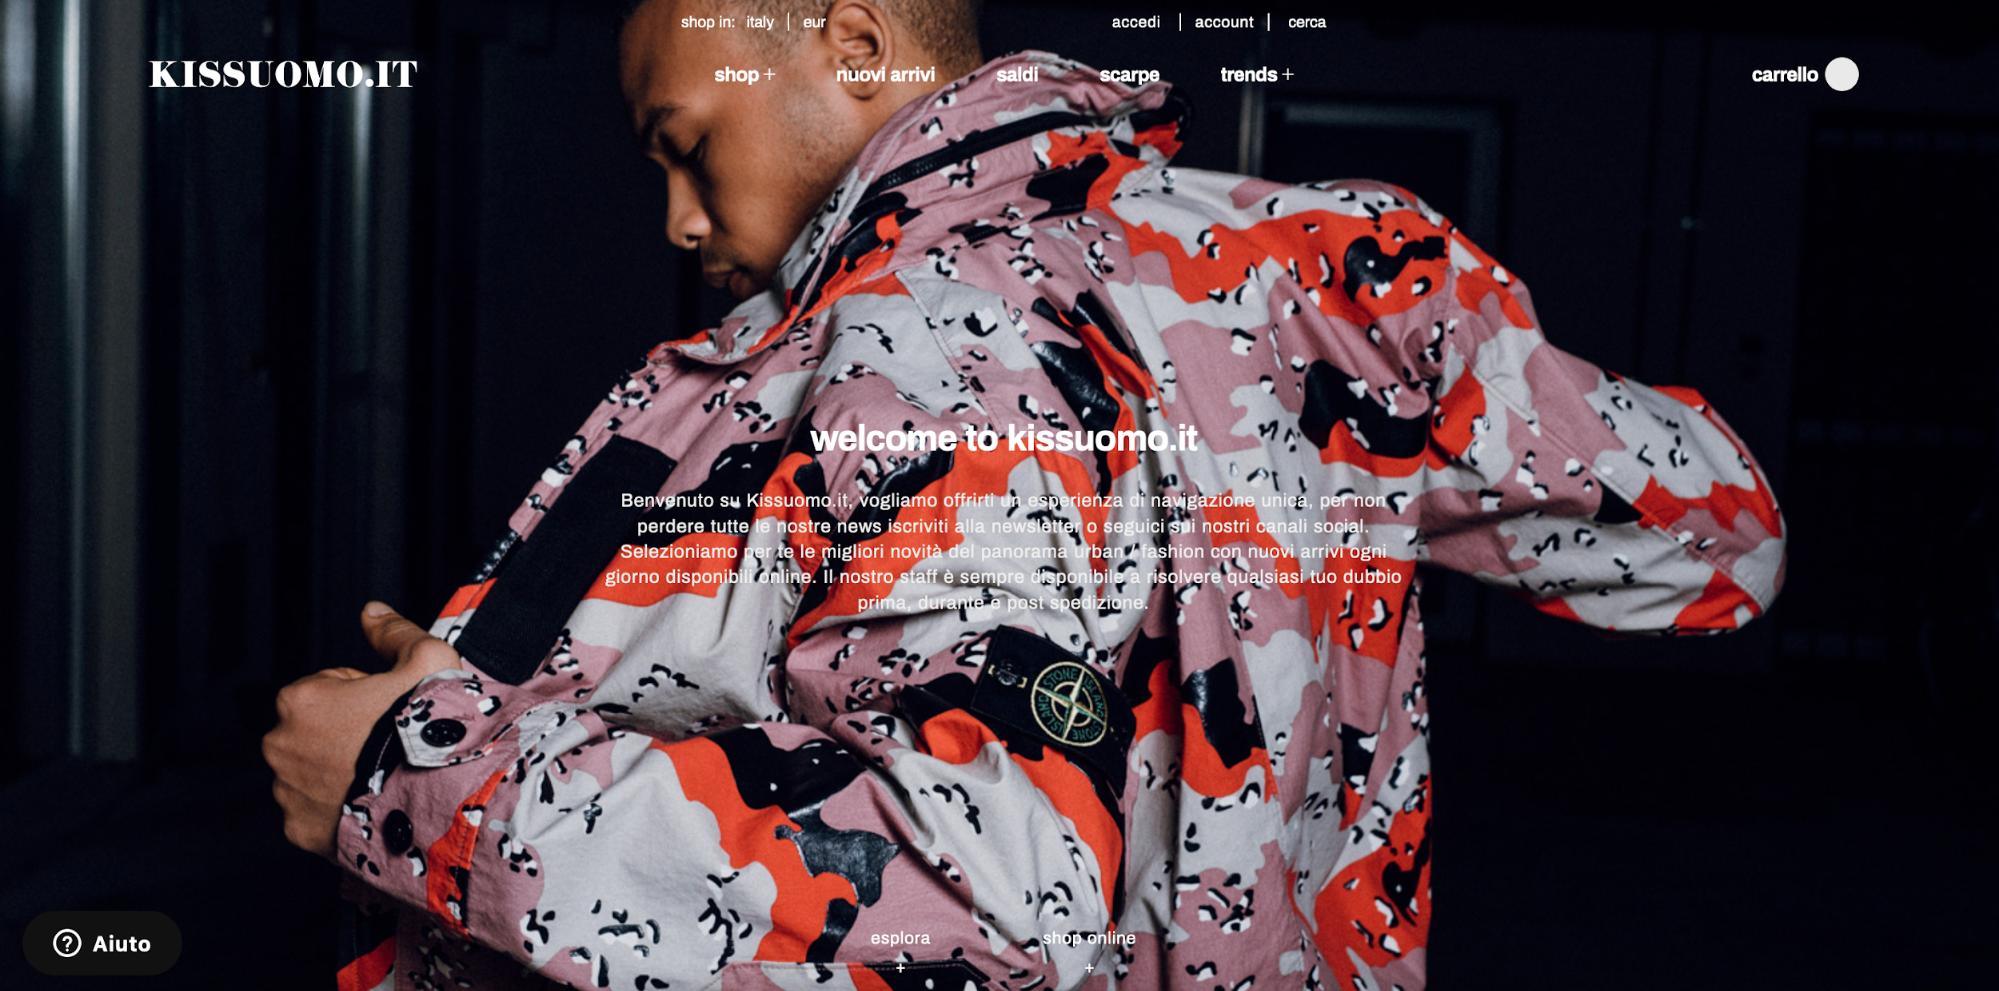 Kissuomo homepage